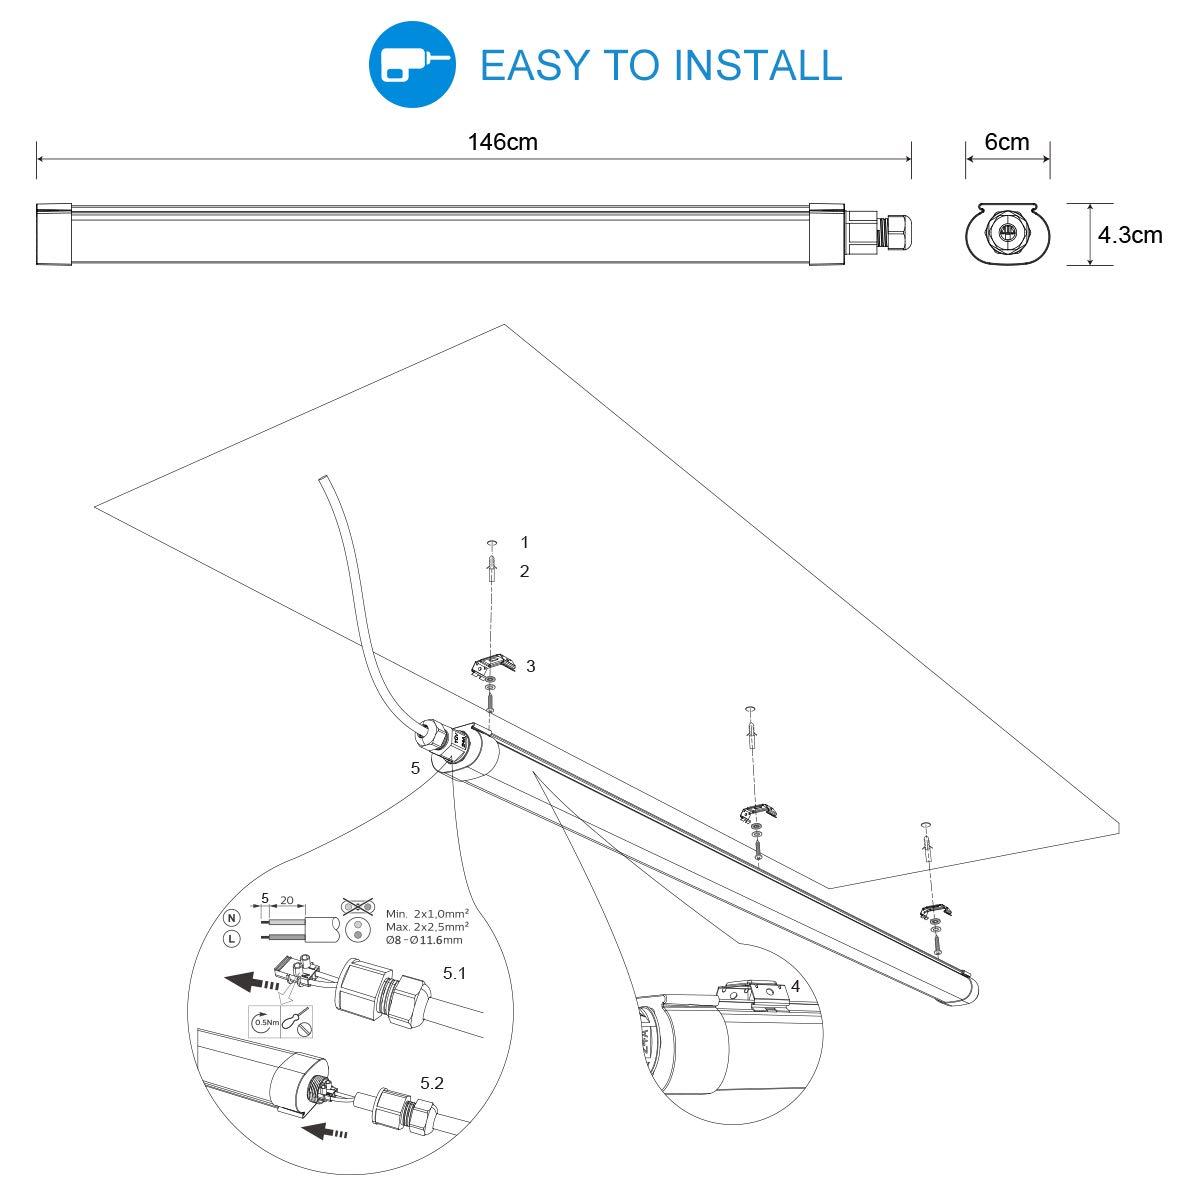 100Lm//W Impermeable IP65 Lampara de Techo LED Plafon para garaje s/ótano ba/ño taller cocina bodega tienda blanco neutro 4000K 51W 5100Lm Tubo fluorescente Oeegoo Tubo LED 150cm